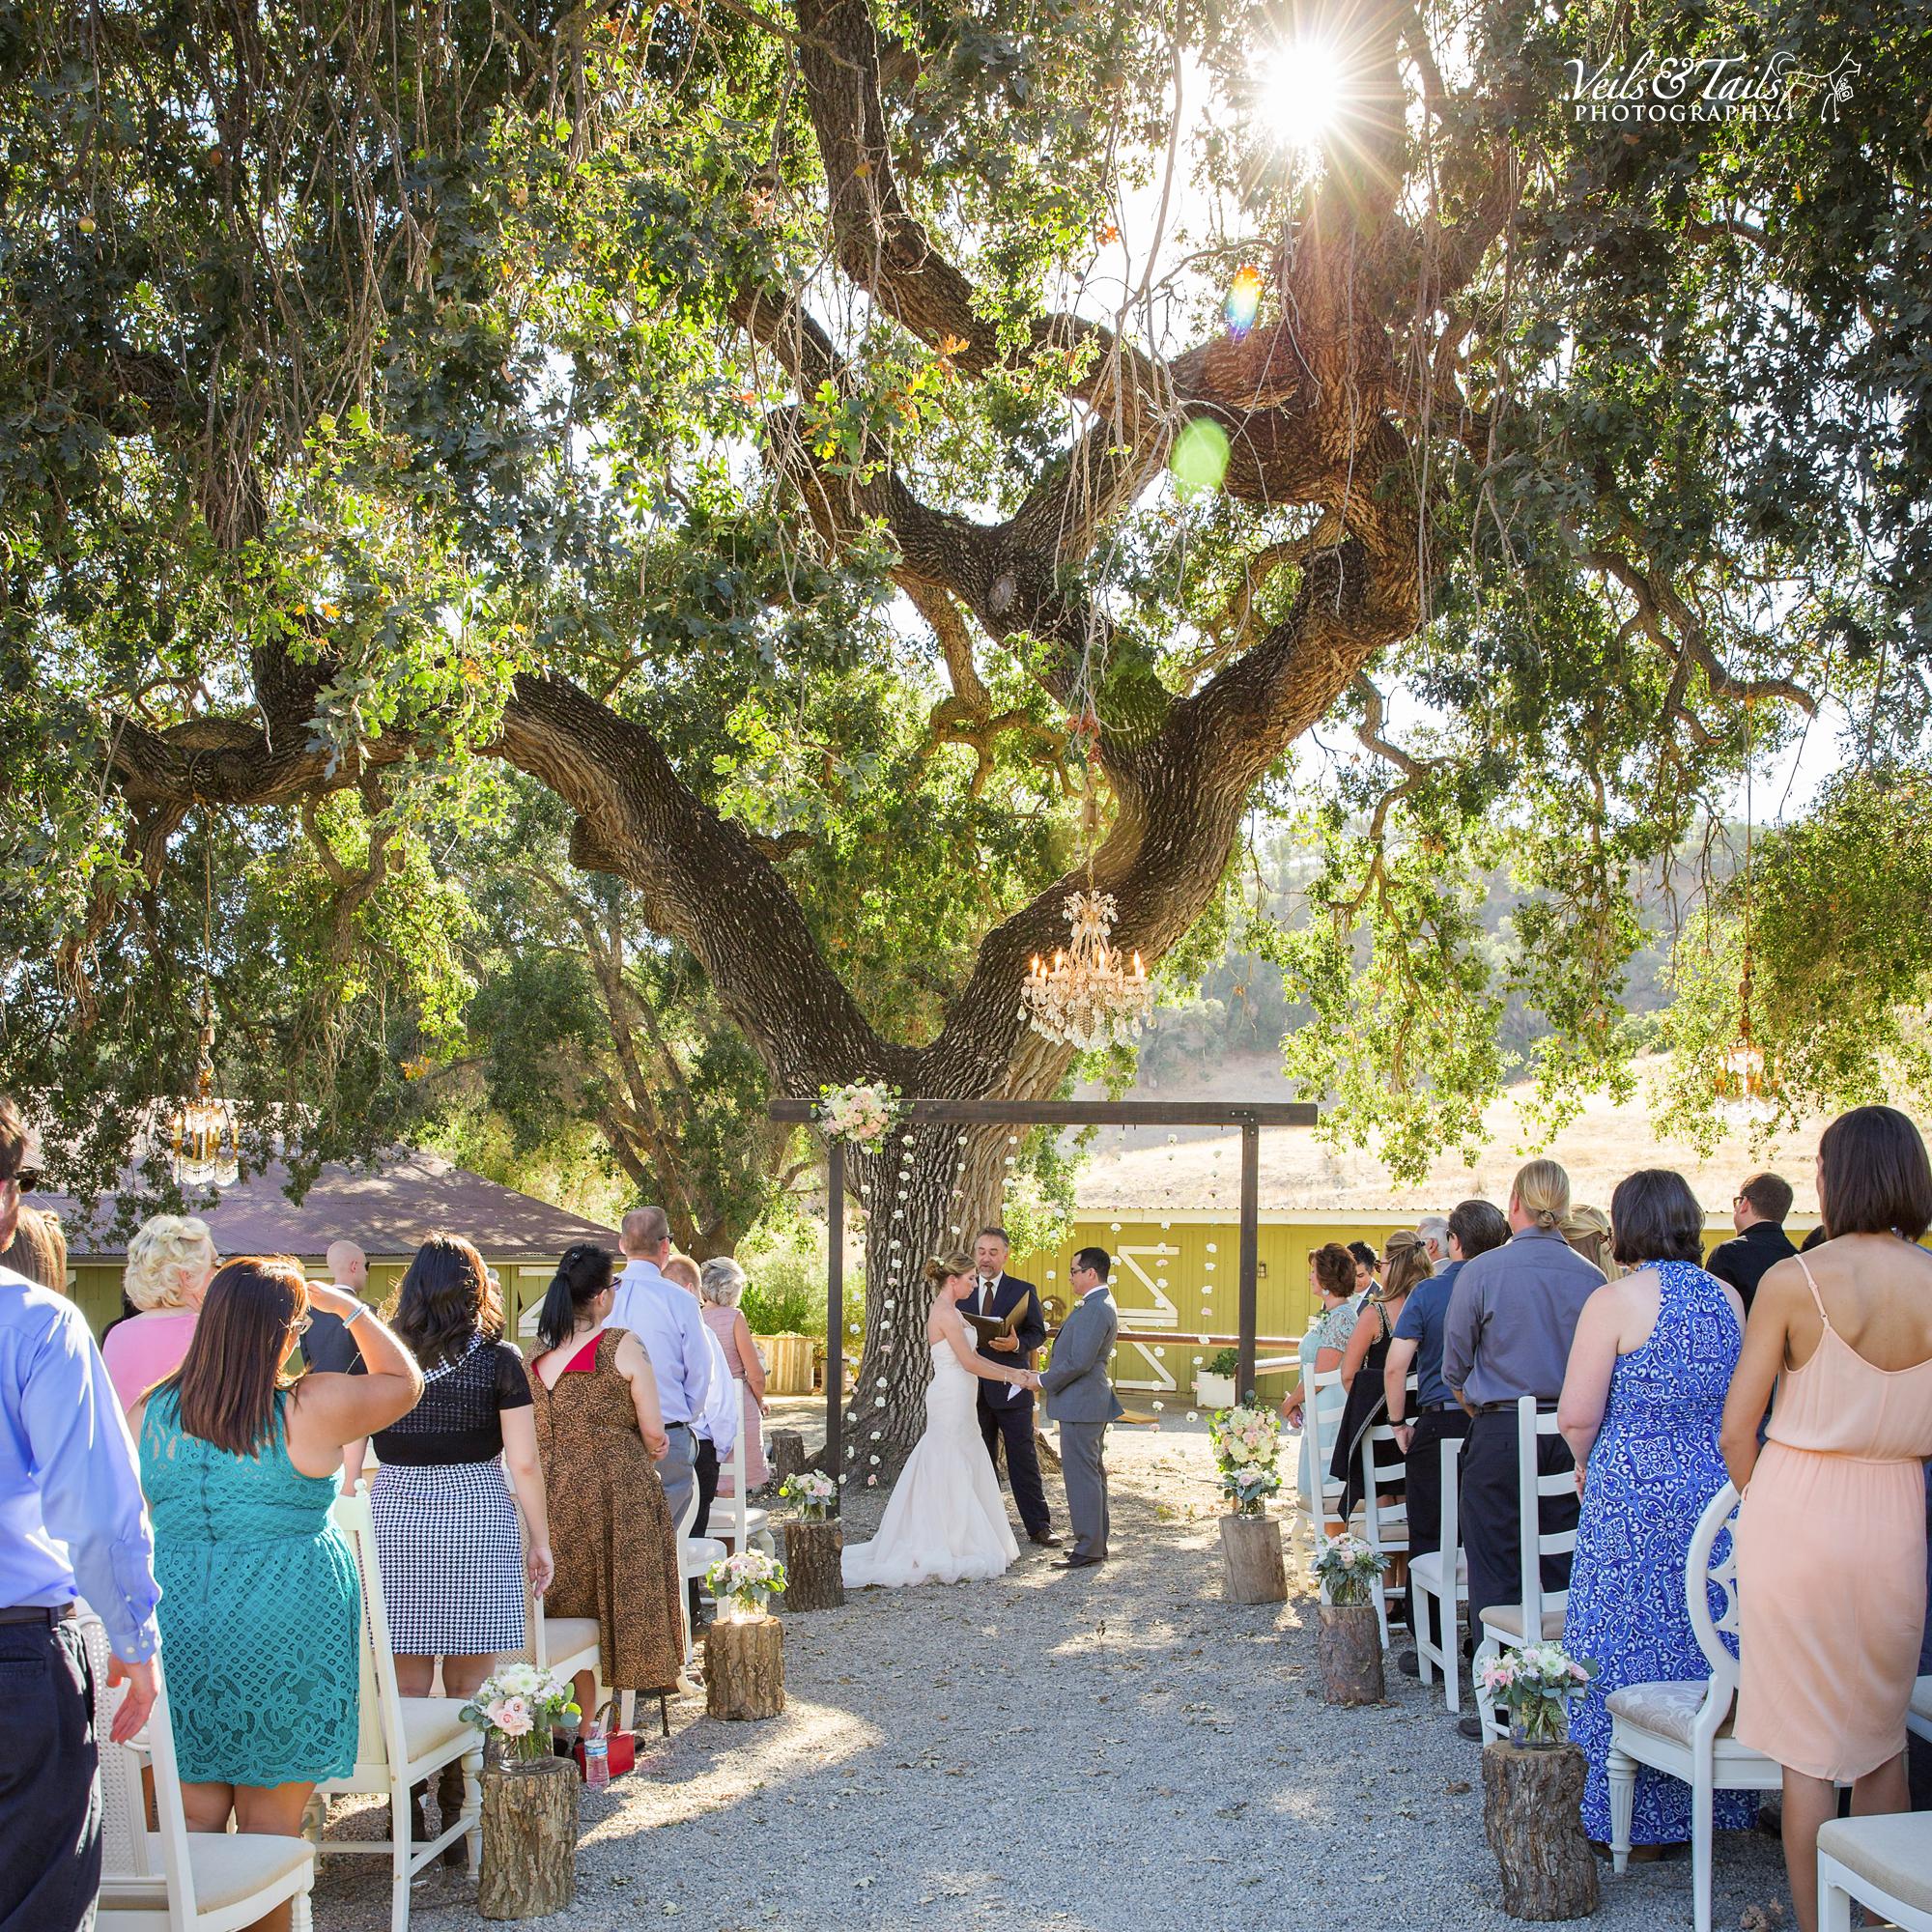 average cost of wedding photographer in california